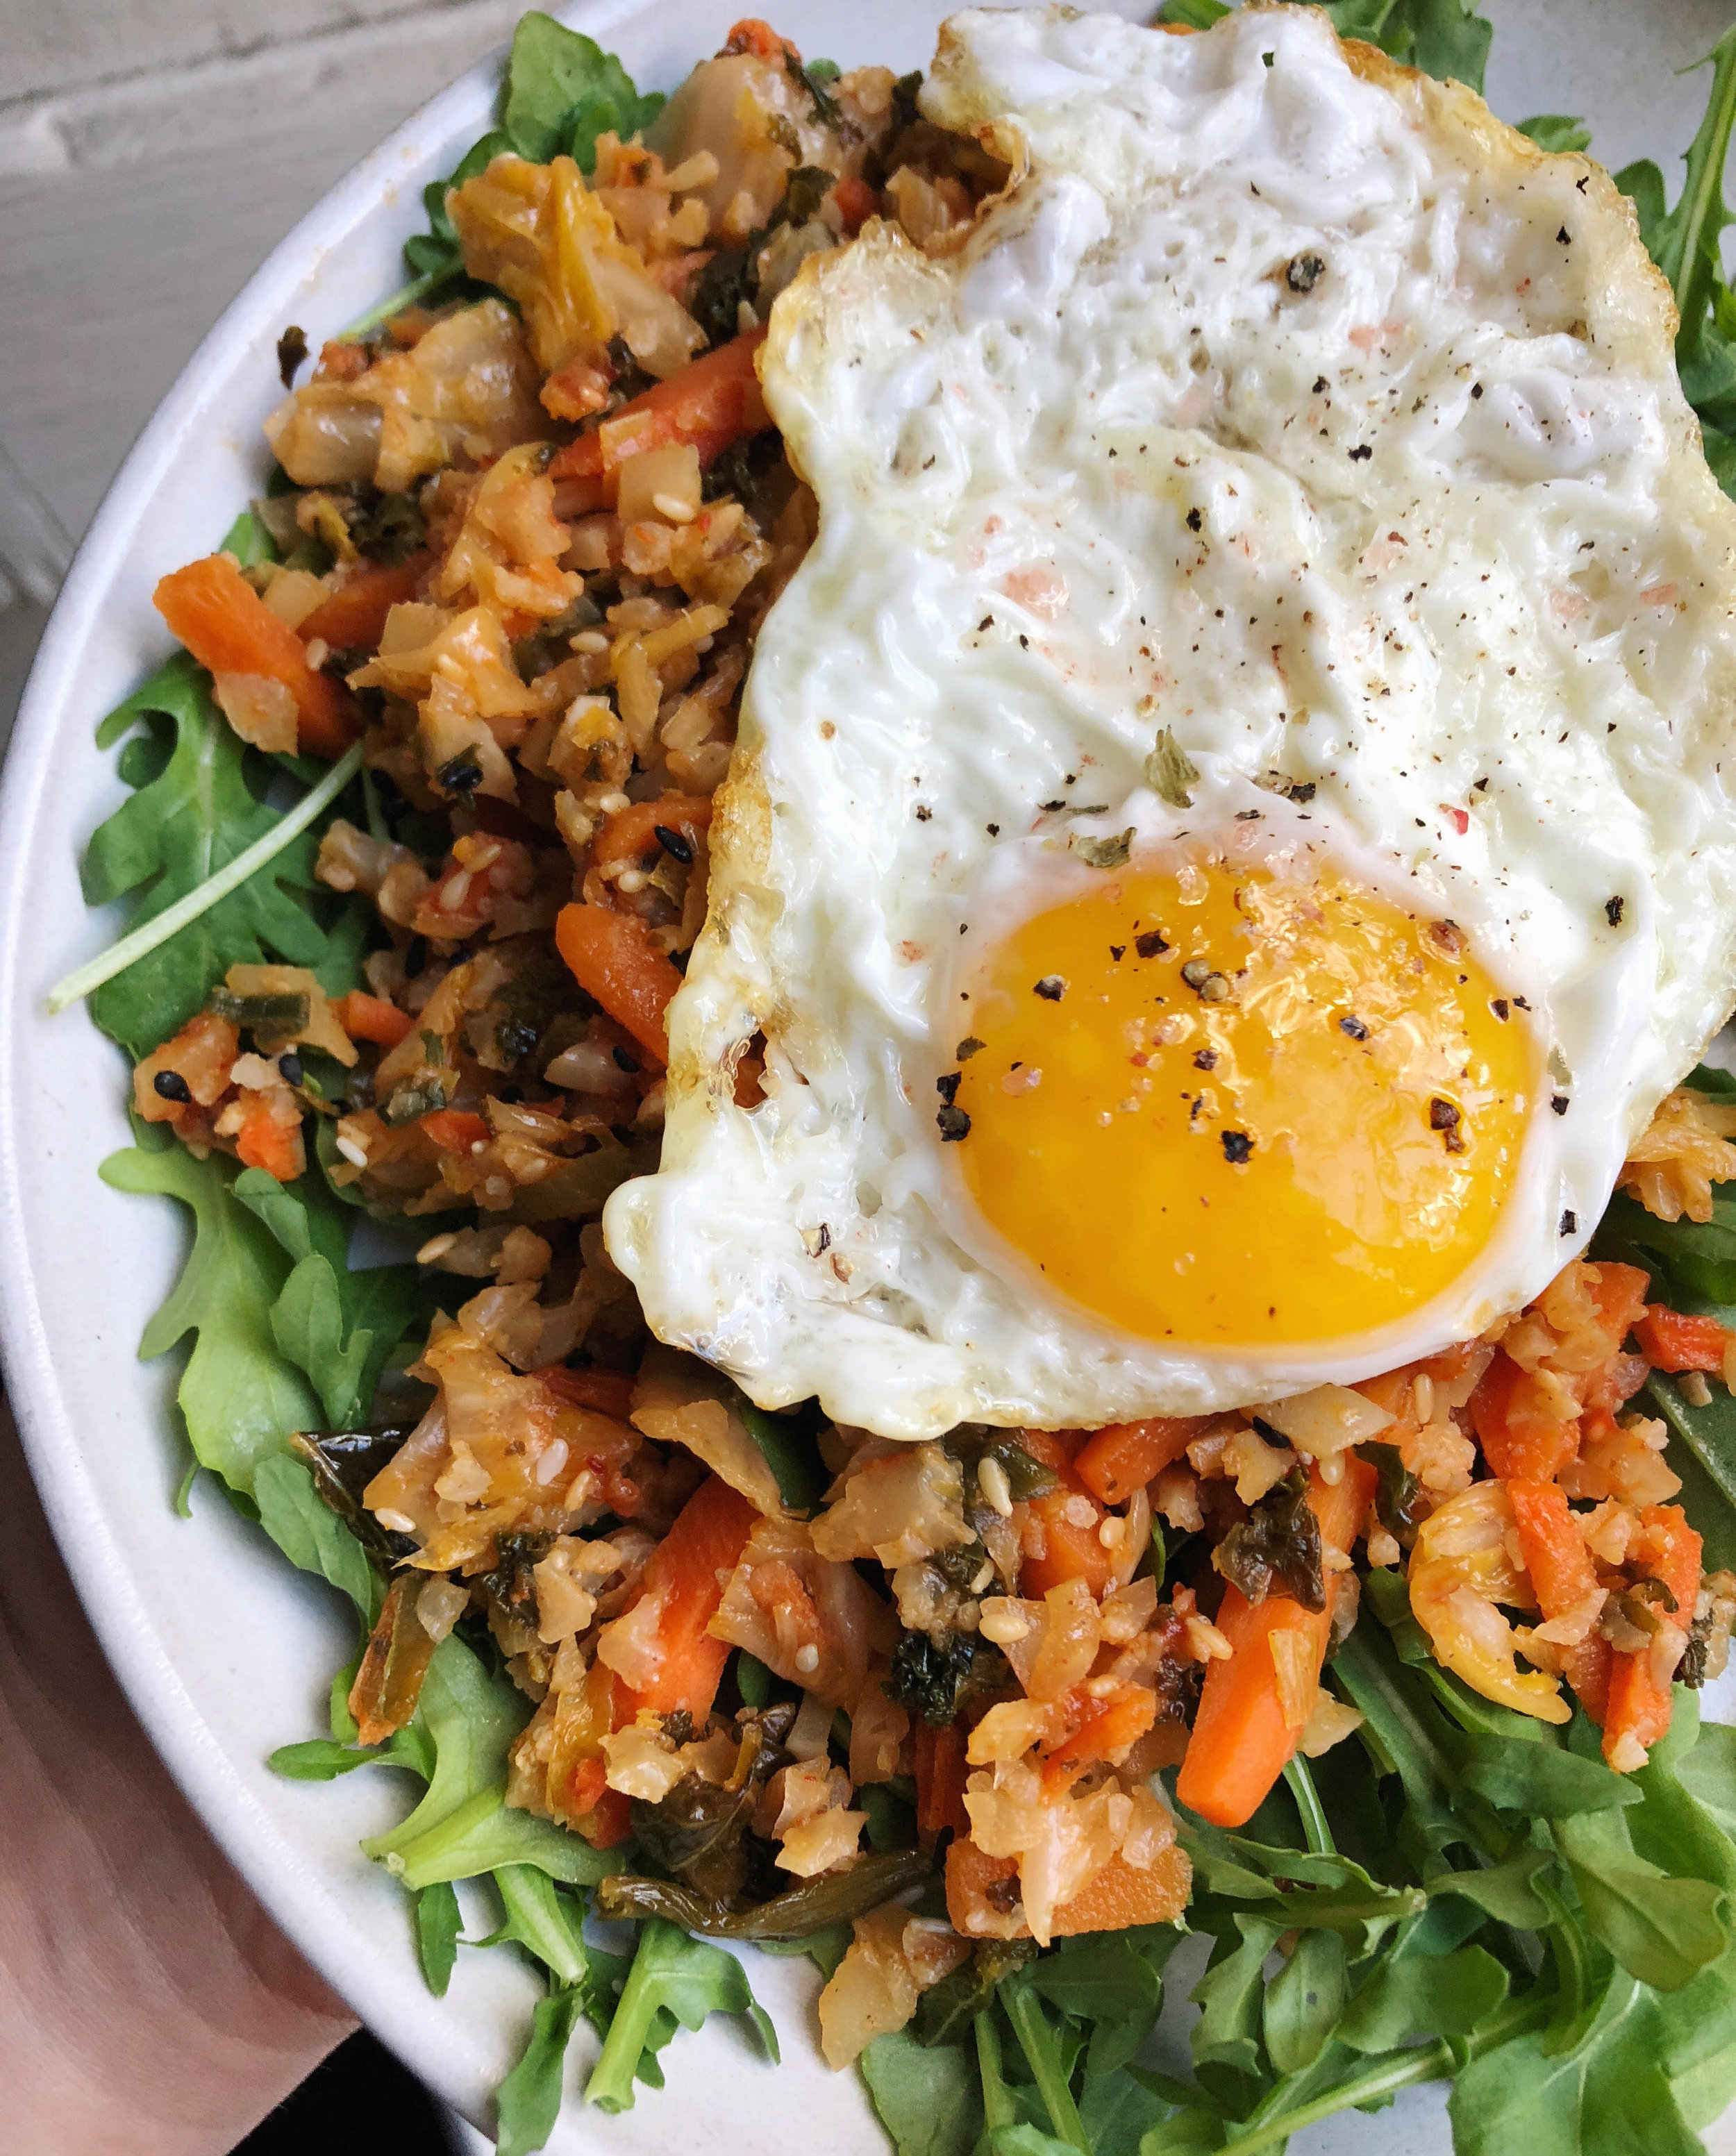 Sunny side up egg on a kimchi and rice stir fry